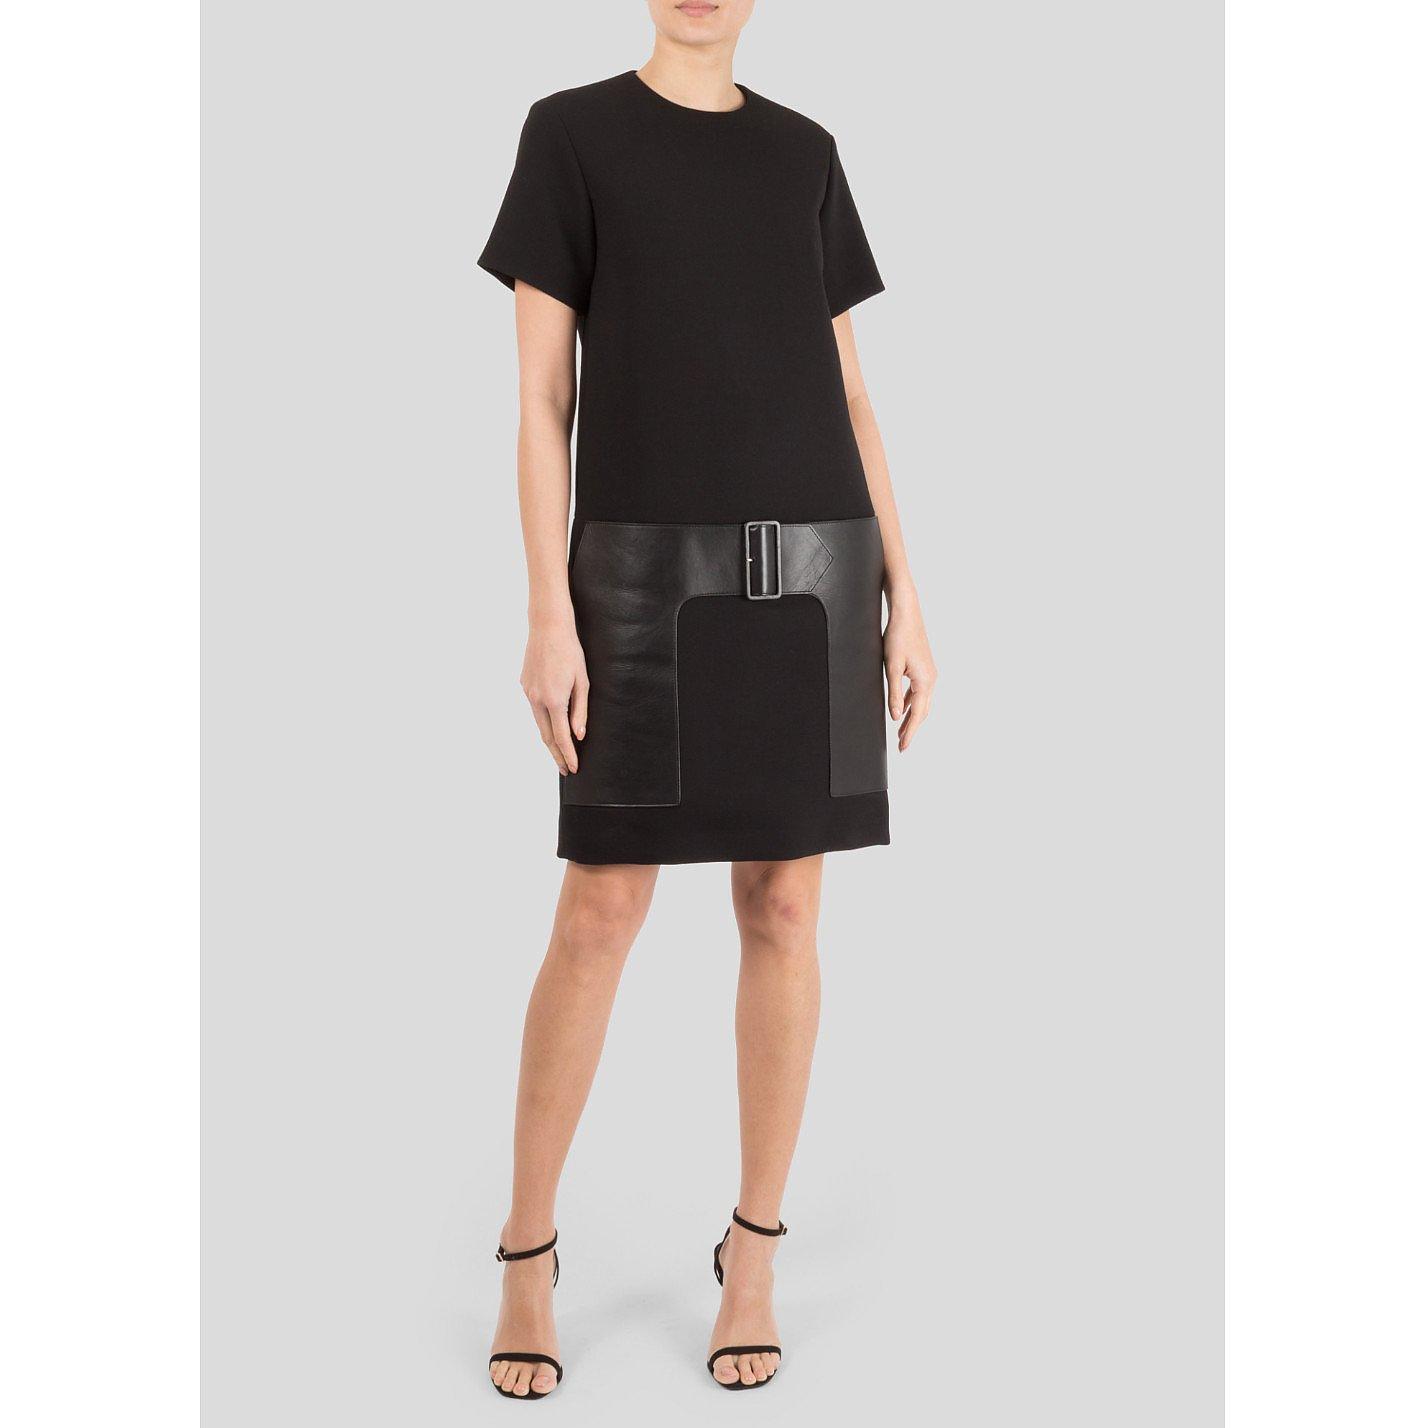 CÉLINE Leather-Trimmed Wool Dress